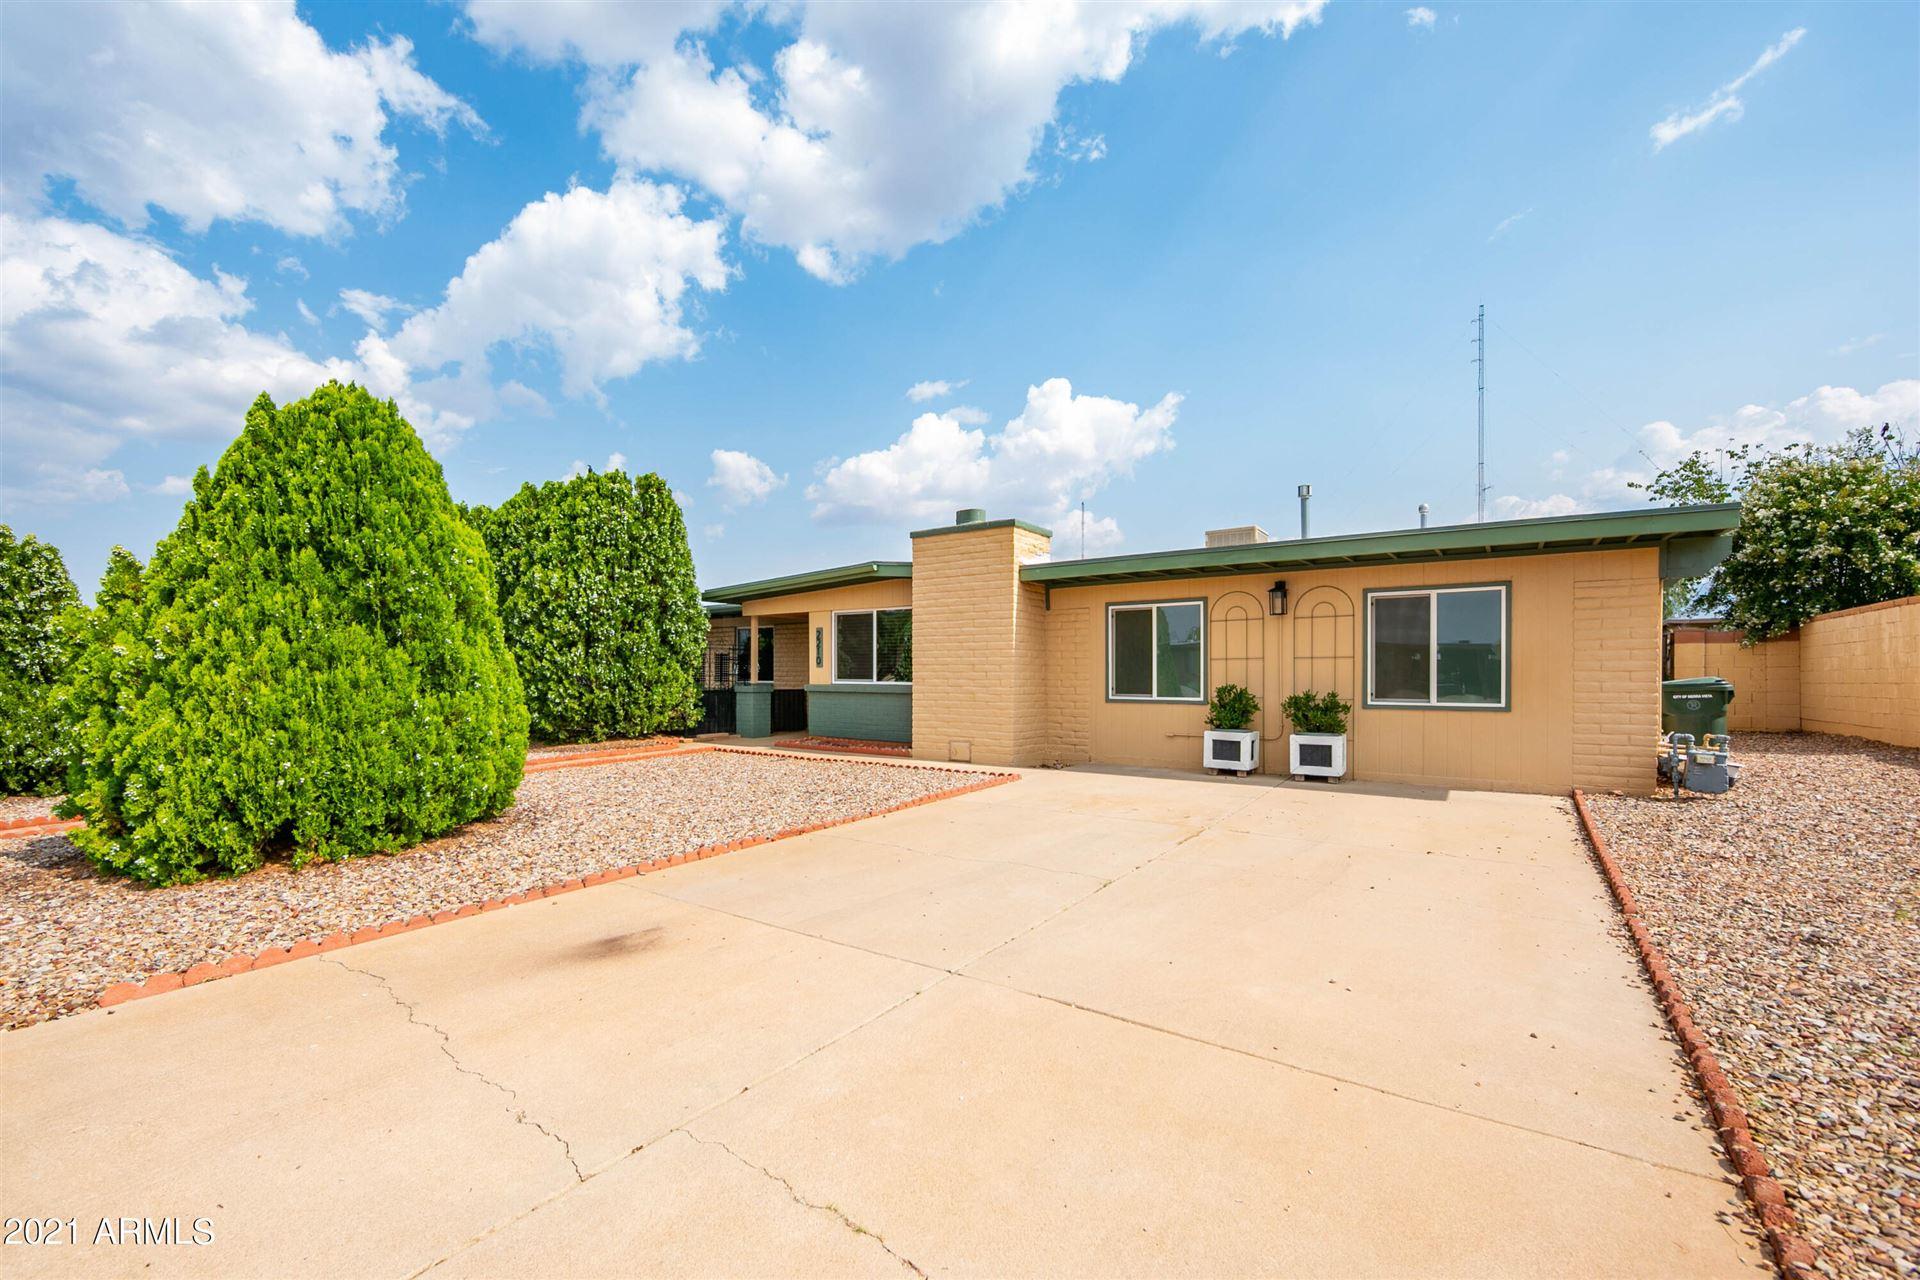 2210 SANTA TERESA Drive, Sierra Vista, AZ 85635 - MLS#: 6269543